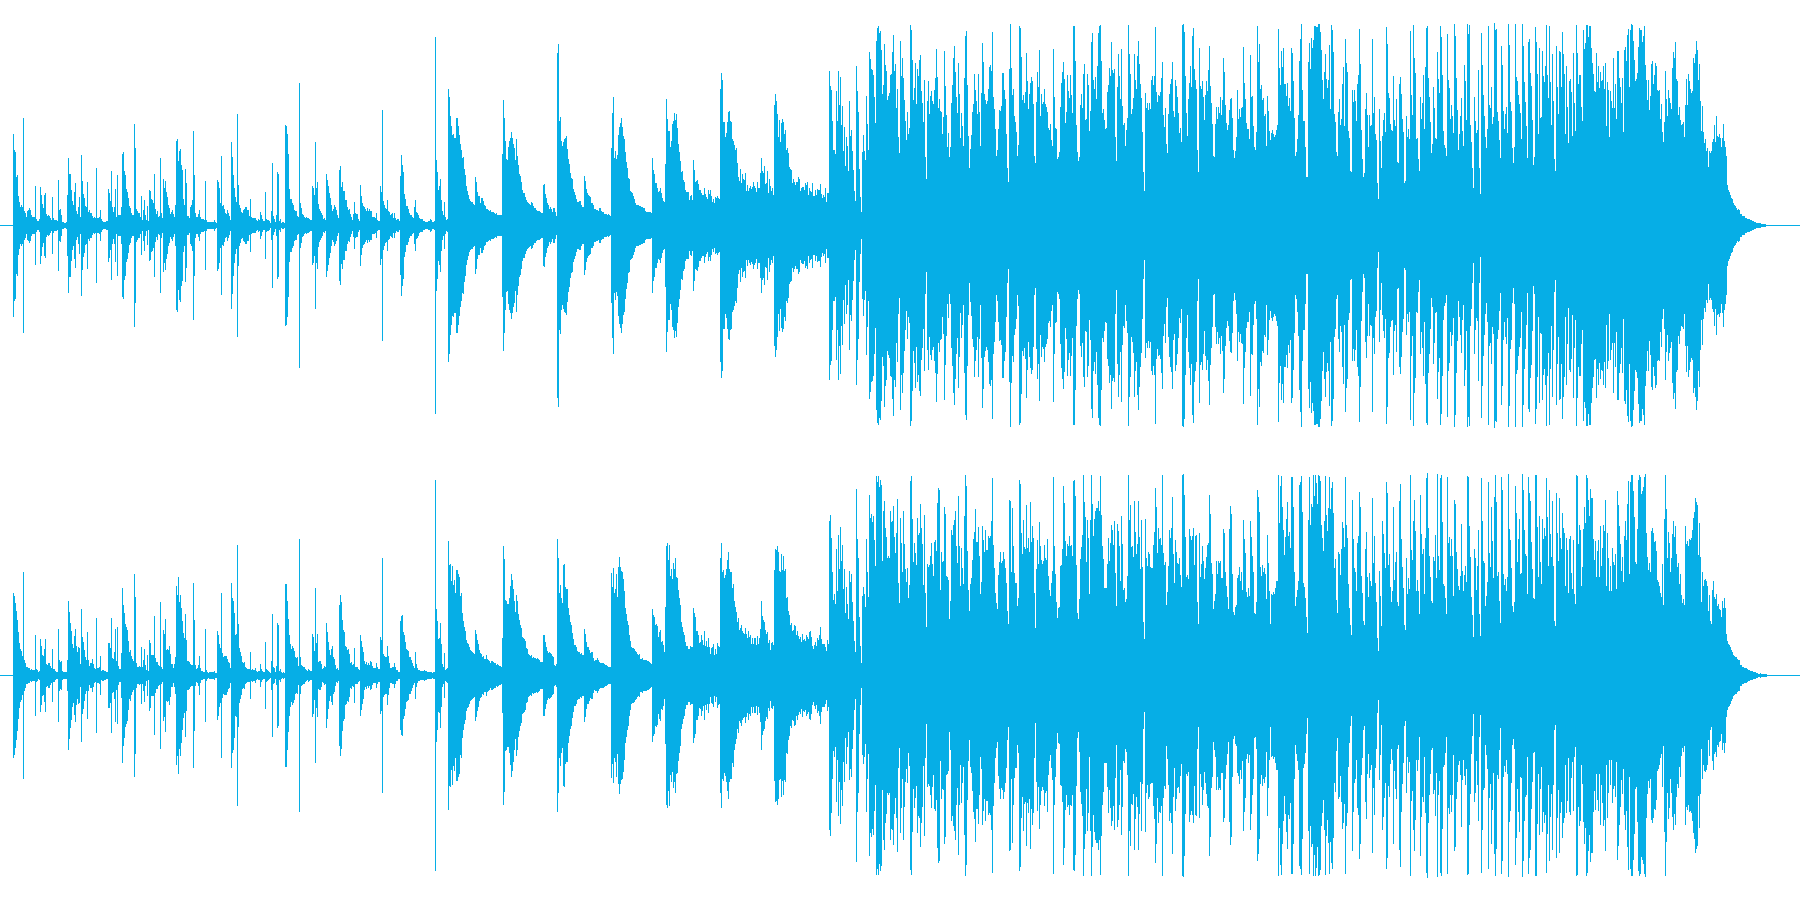 kawaii池ポチャフューチャーベースの再生済みの波形